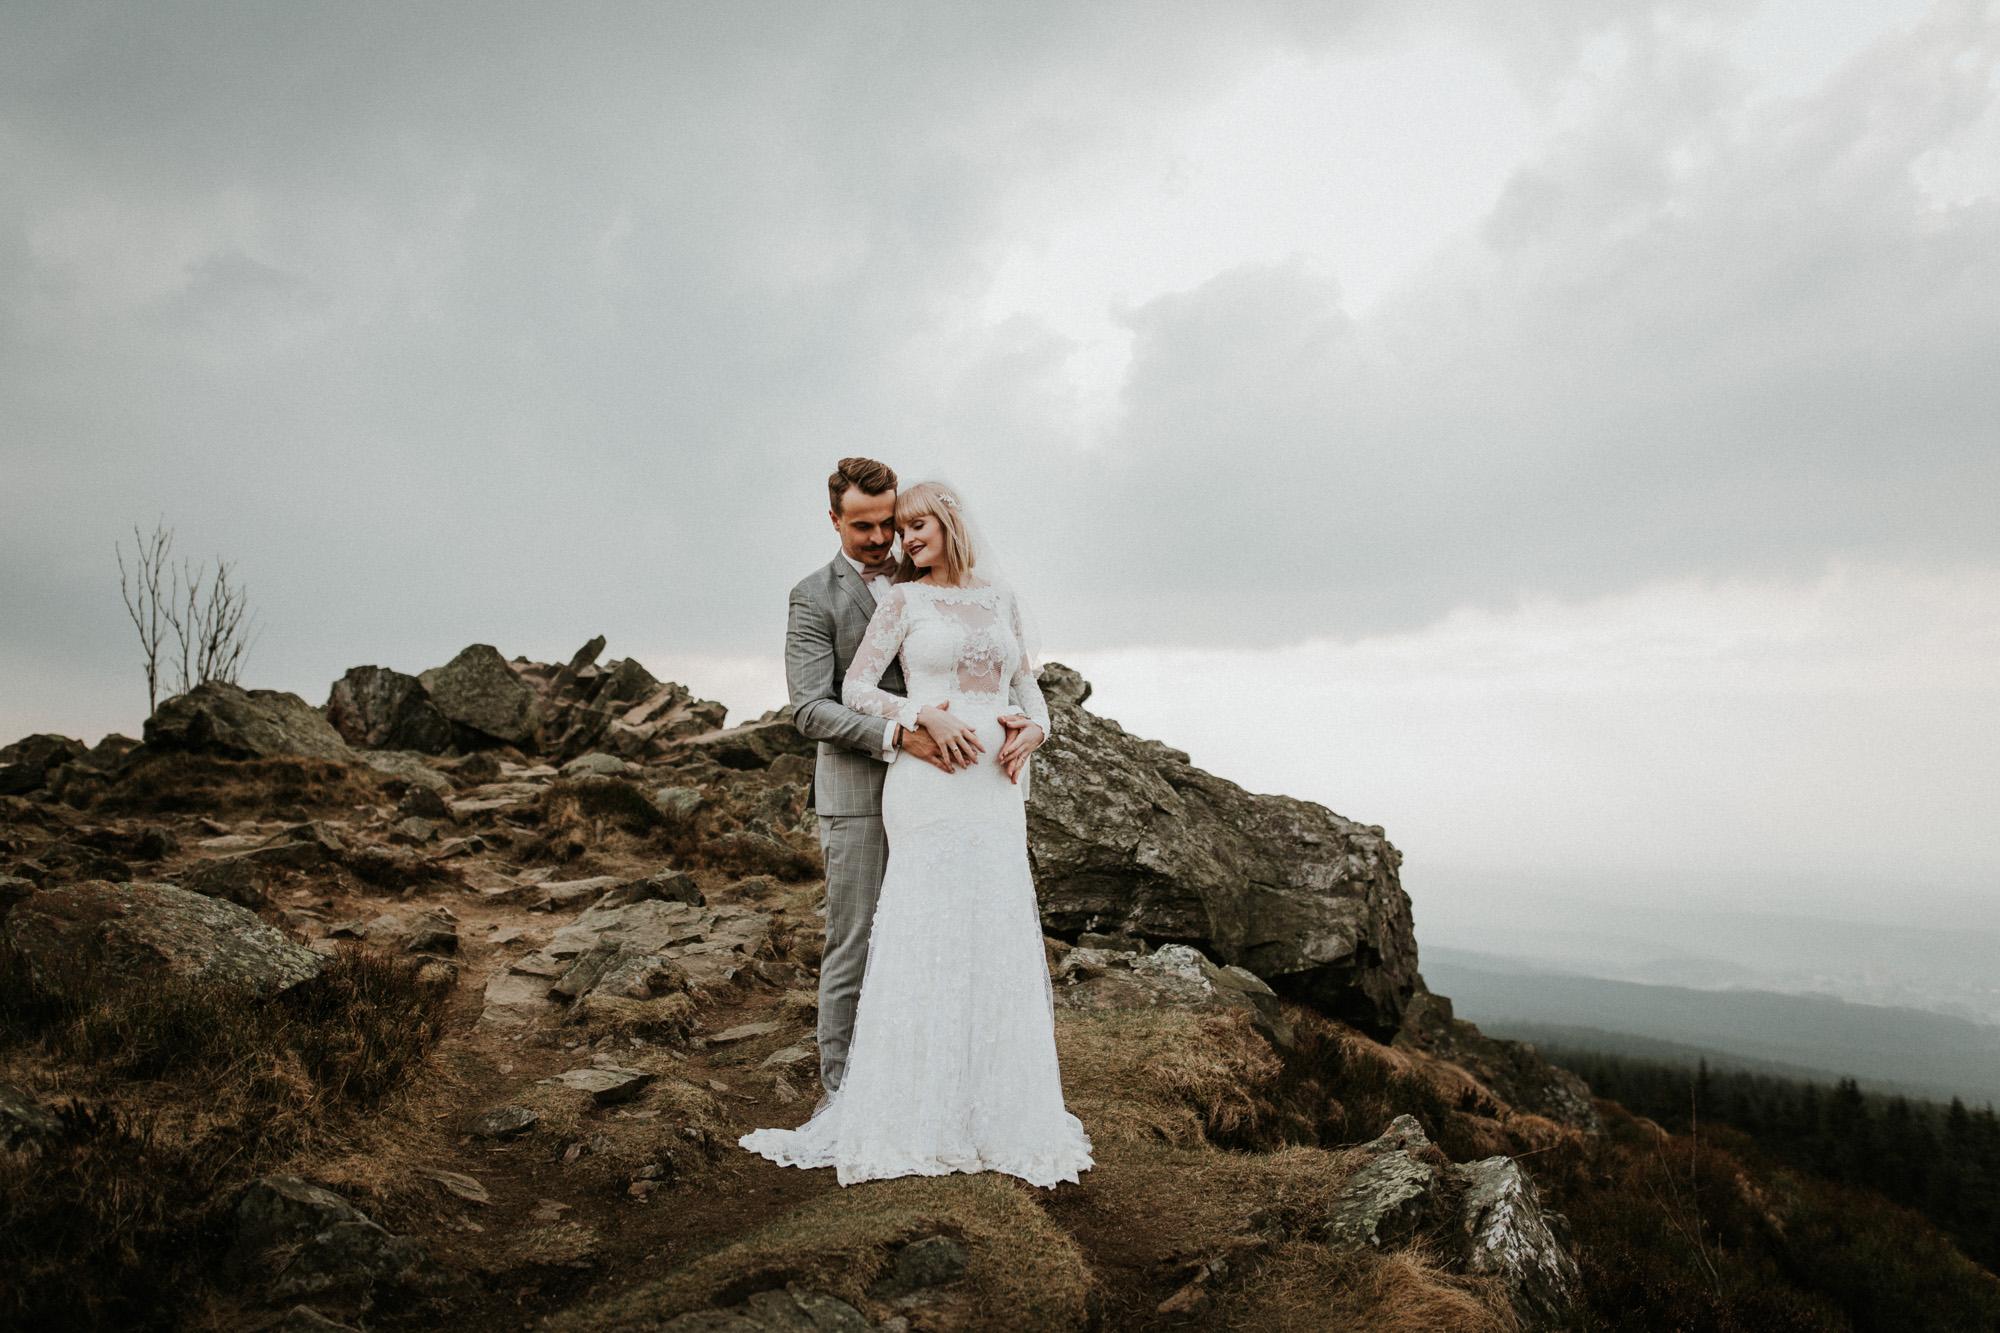 DanielaMarquardtPhotography_Hochzeitsfotograf_Düsseldorf_Köln_Mallorca_Bayern_Austria_Harz_LinaundMaik_Afterwedding-Shooting_Weddingphotographer_Ibiza_Tuskany_Italien_Toskana56